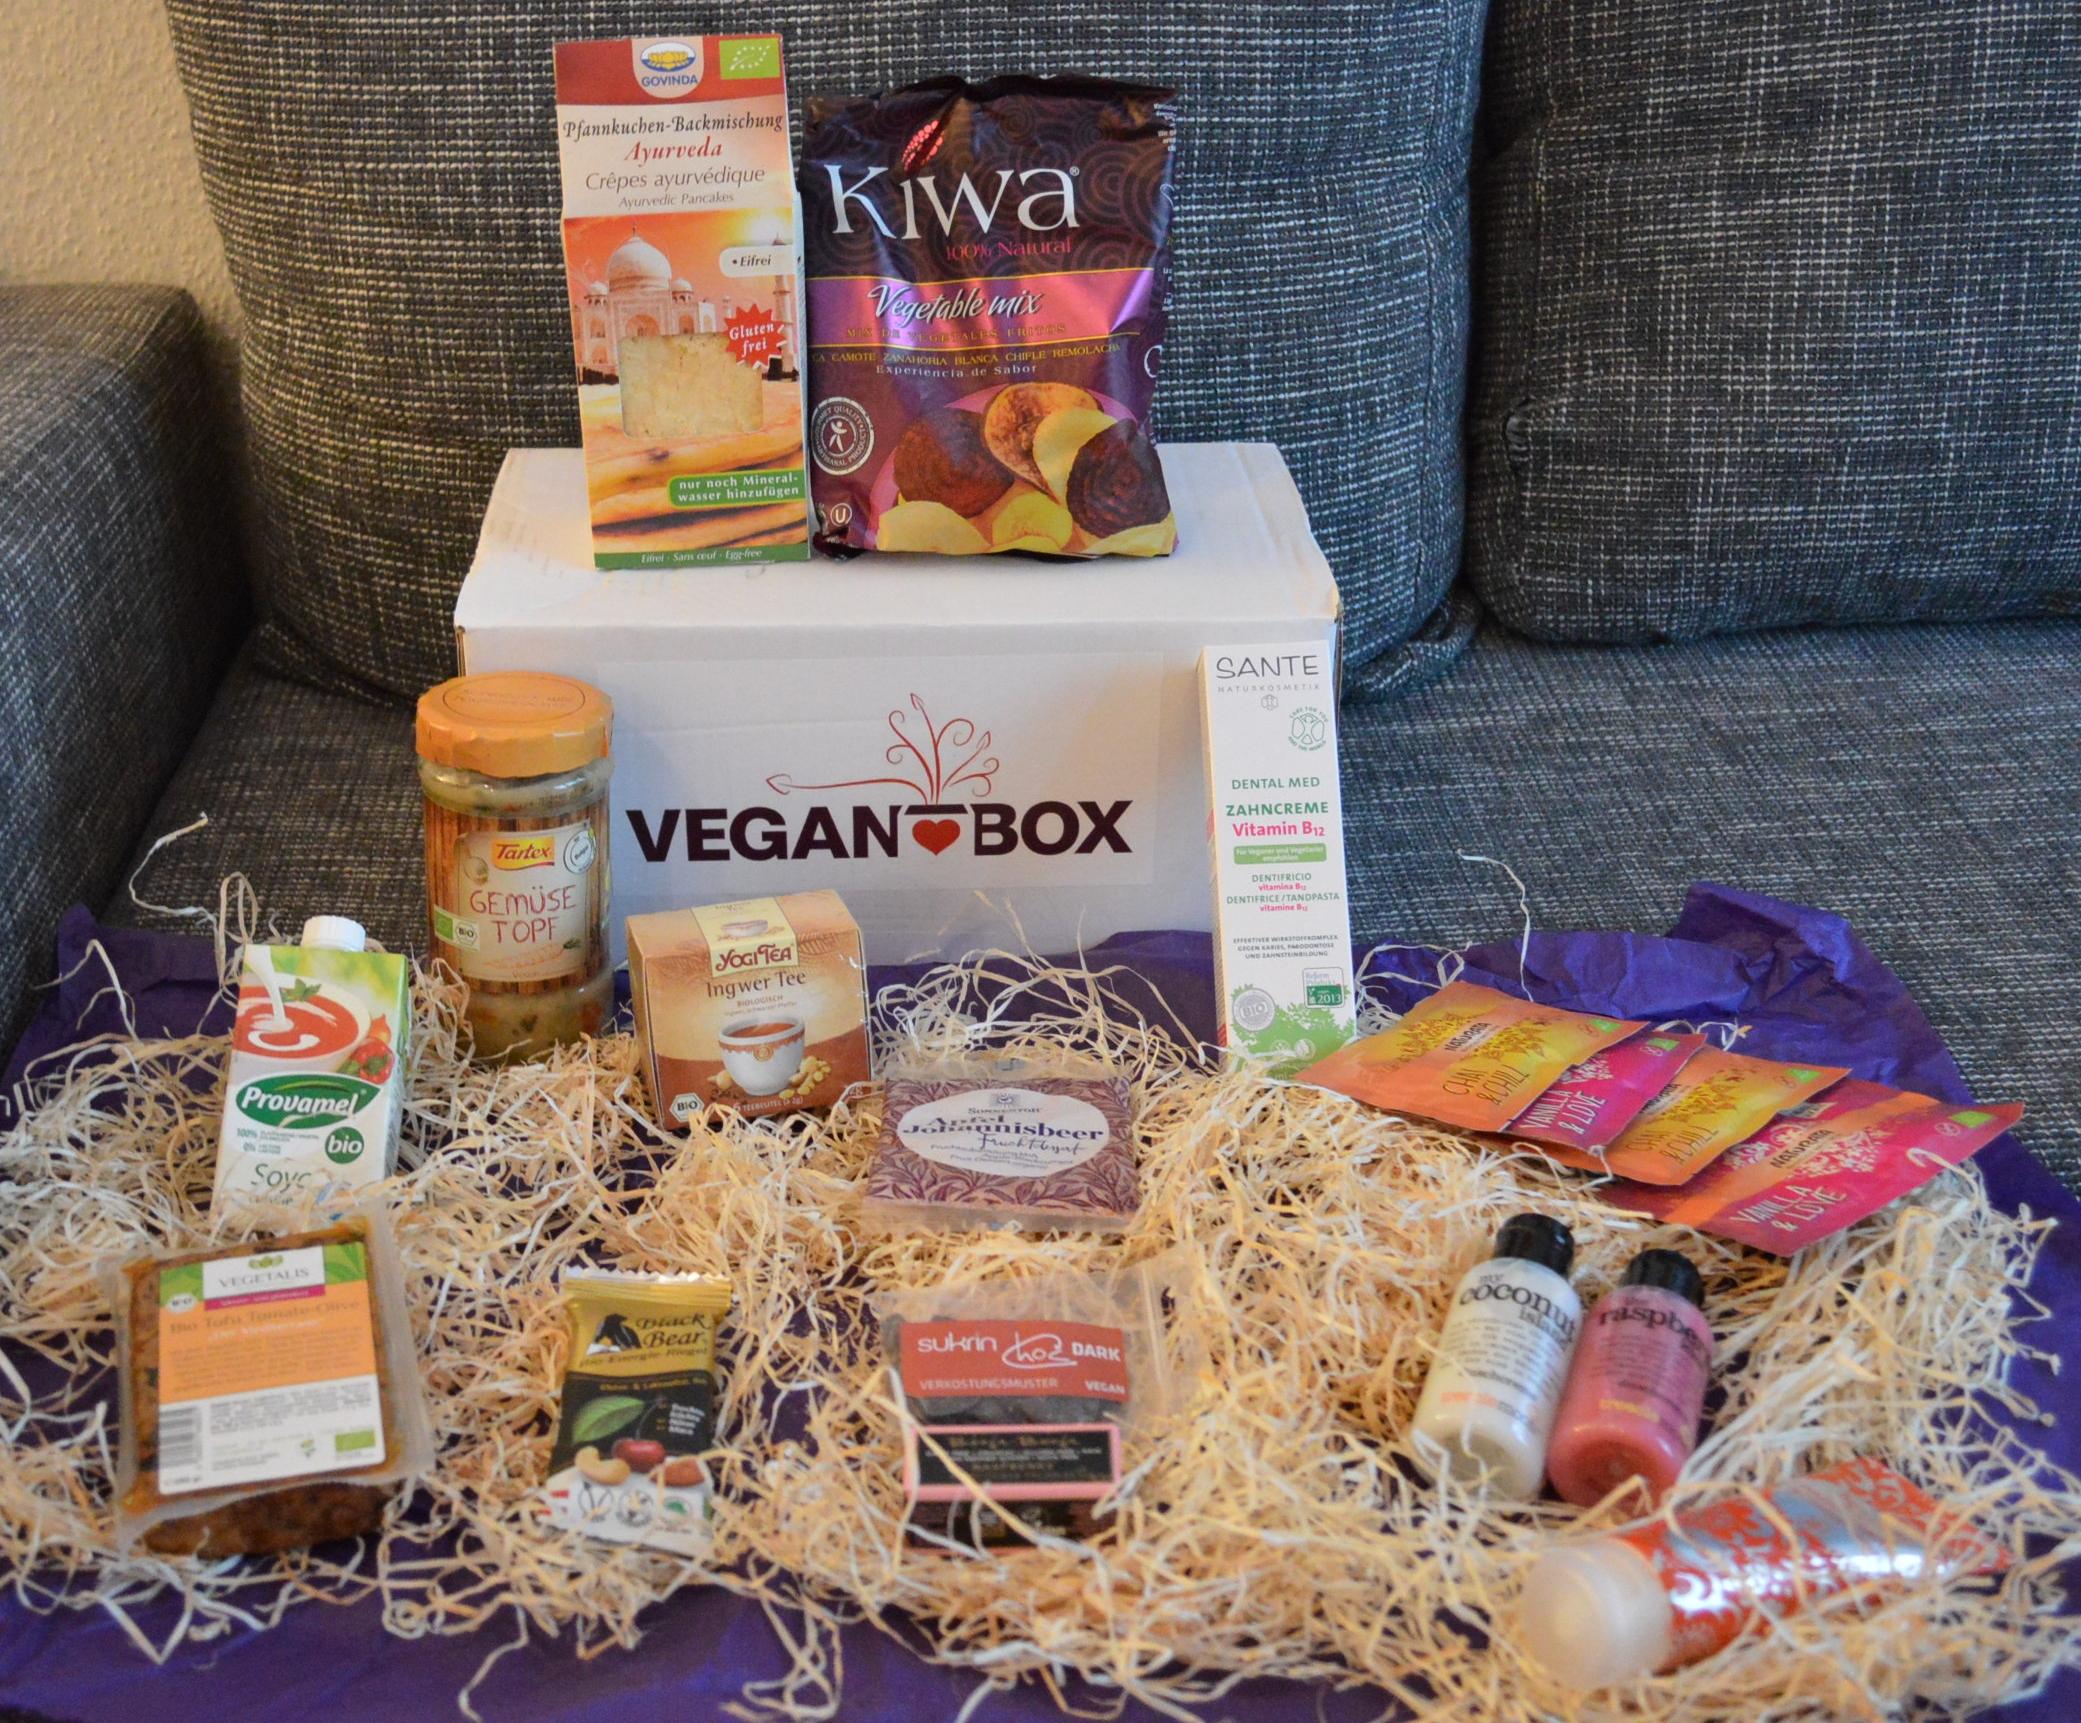 Vegan Box Oktober, vegane Produkte, Provamel, Tofu, Schokolade, Kosmetik